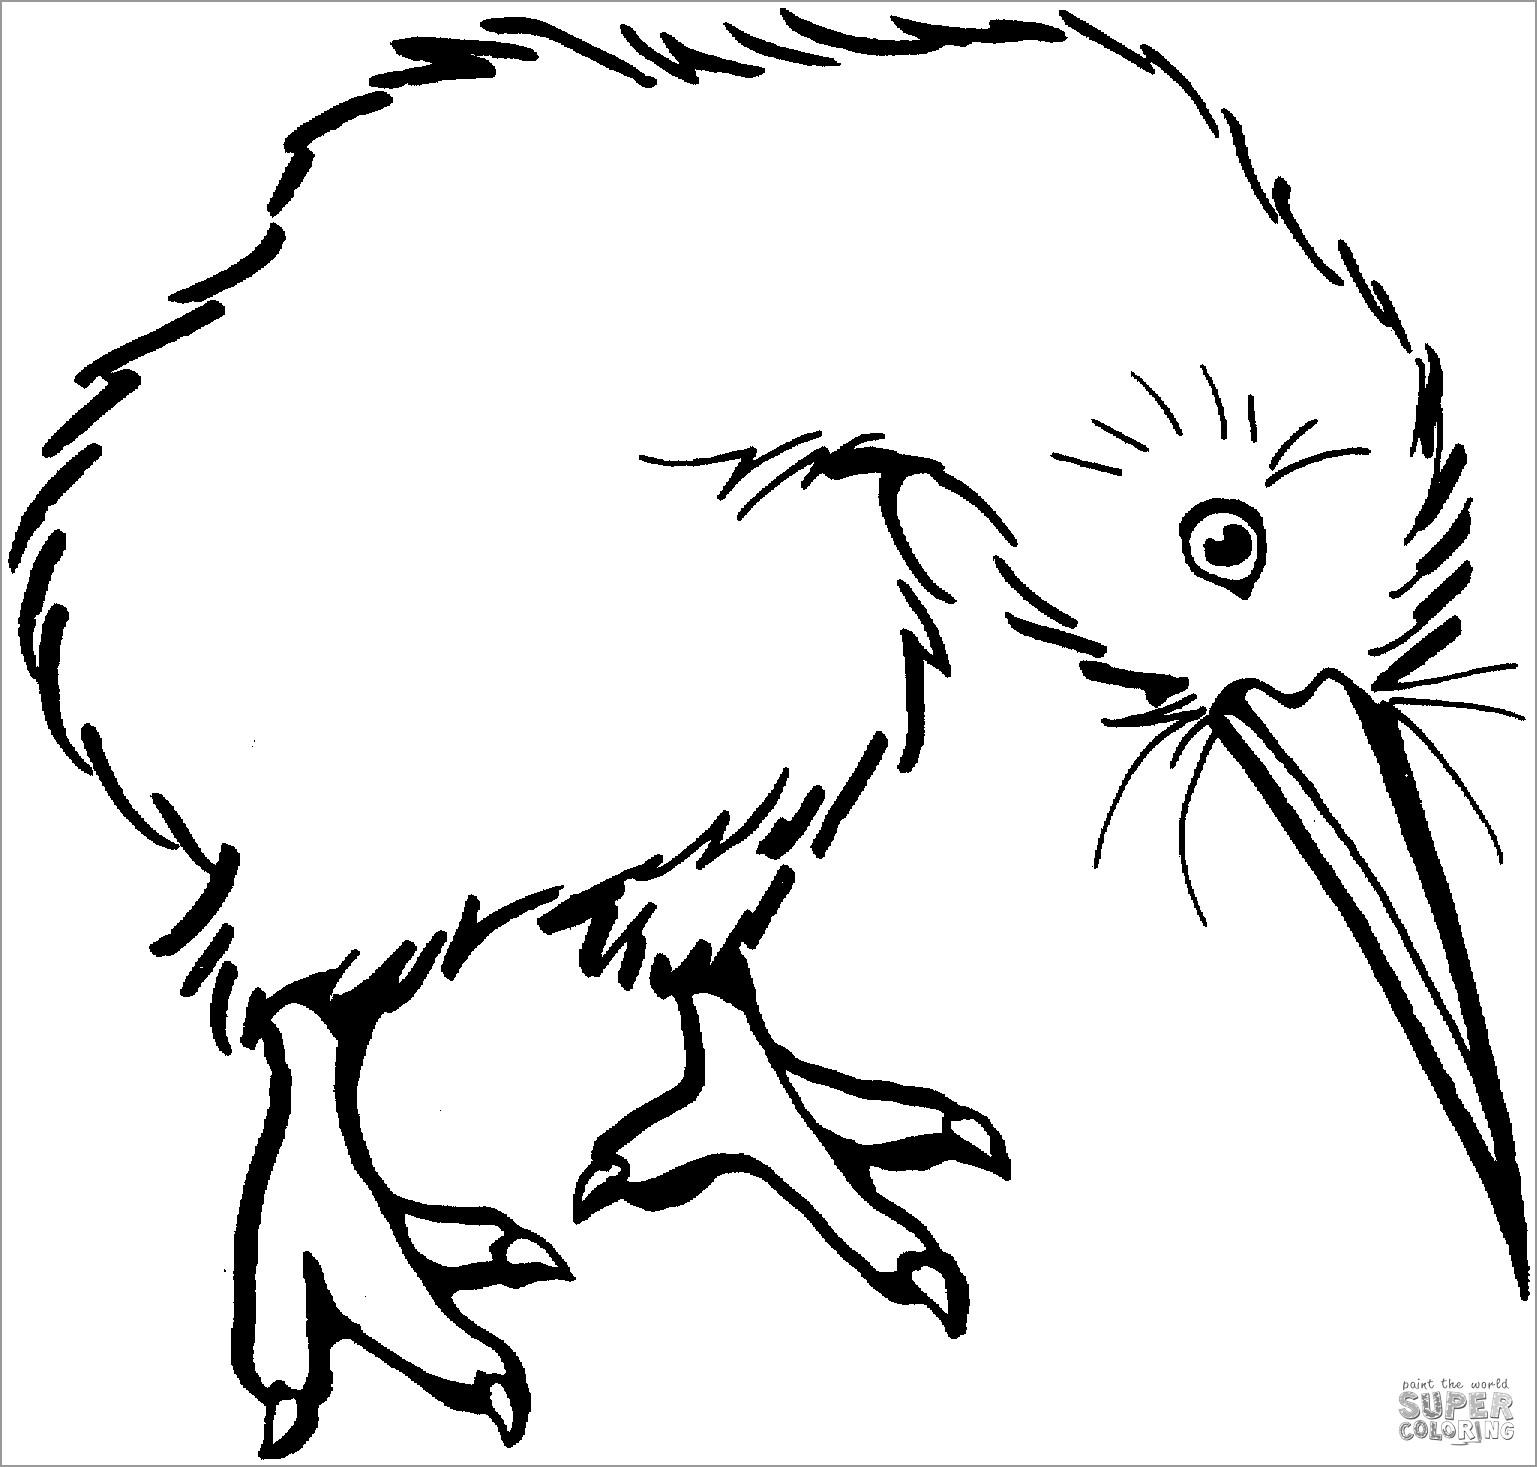 Coloring Page Of Kiwi Bird